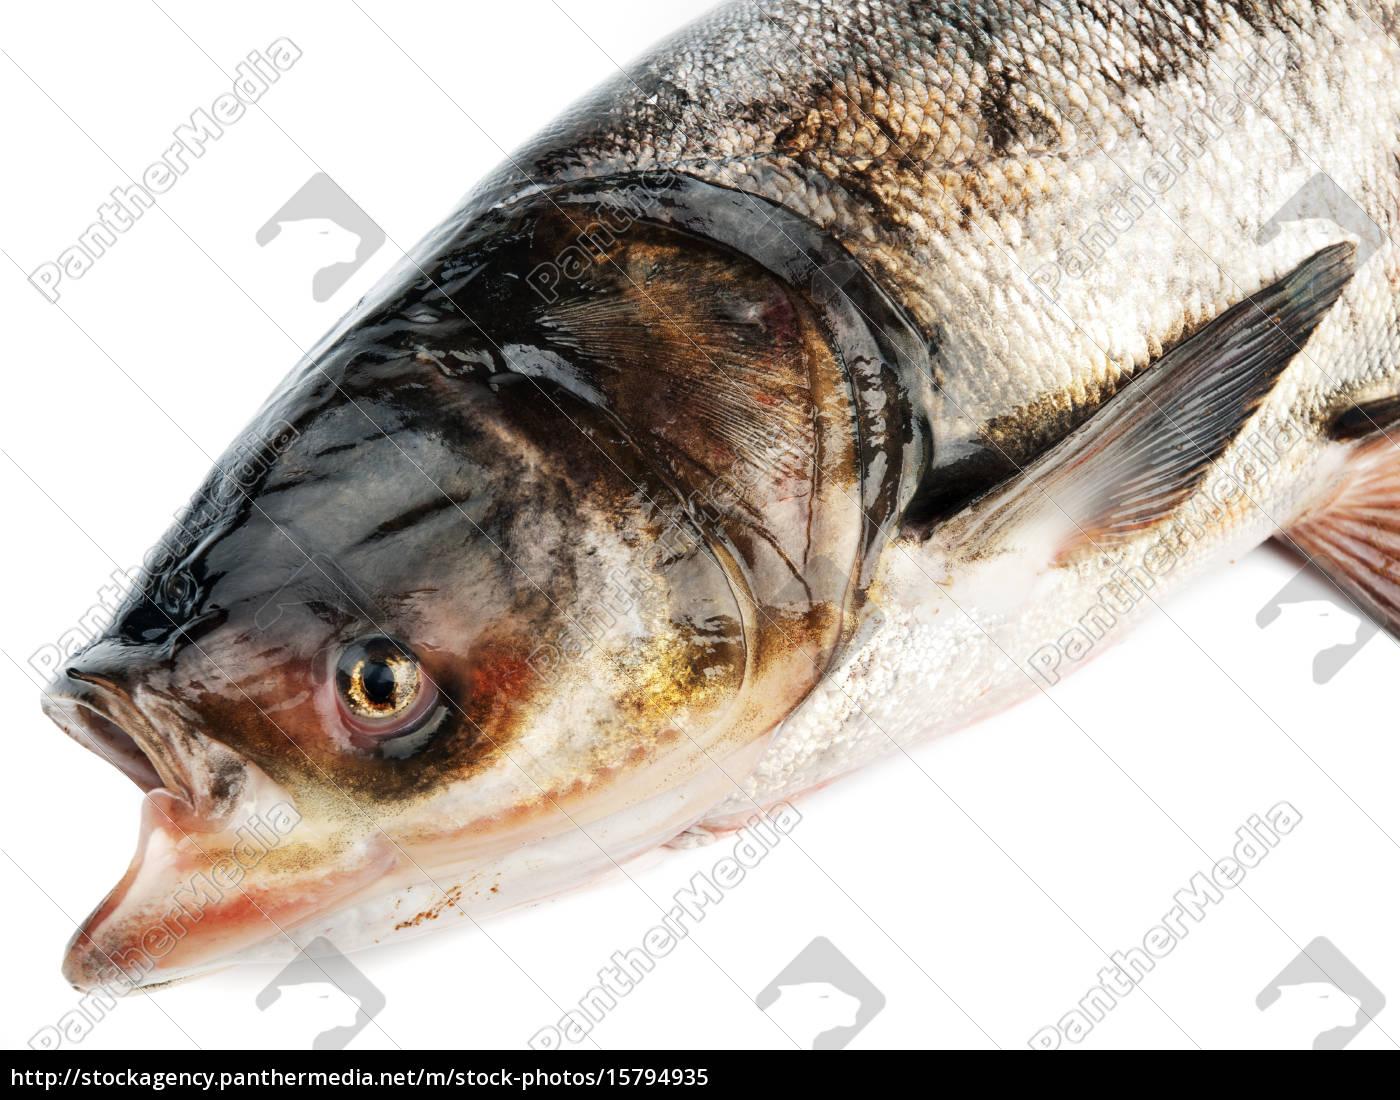 bighead, carp, bighead, carp, bighead, carp, bighead, carp - 15794935